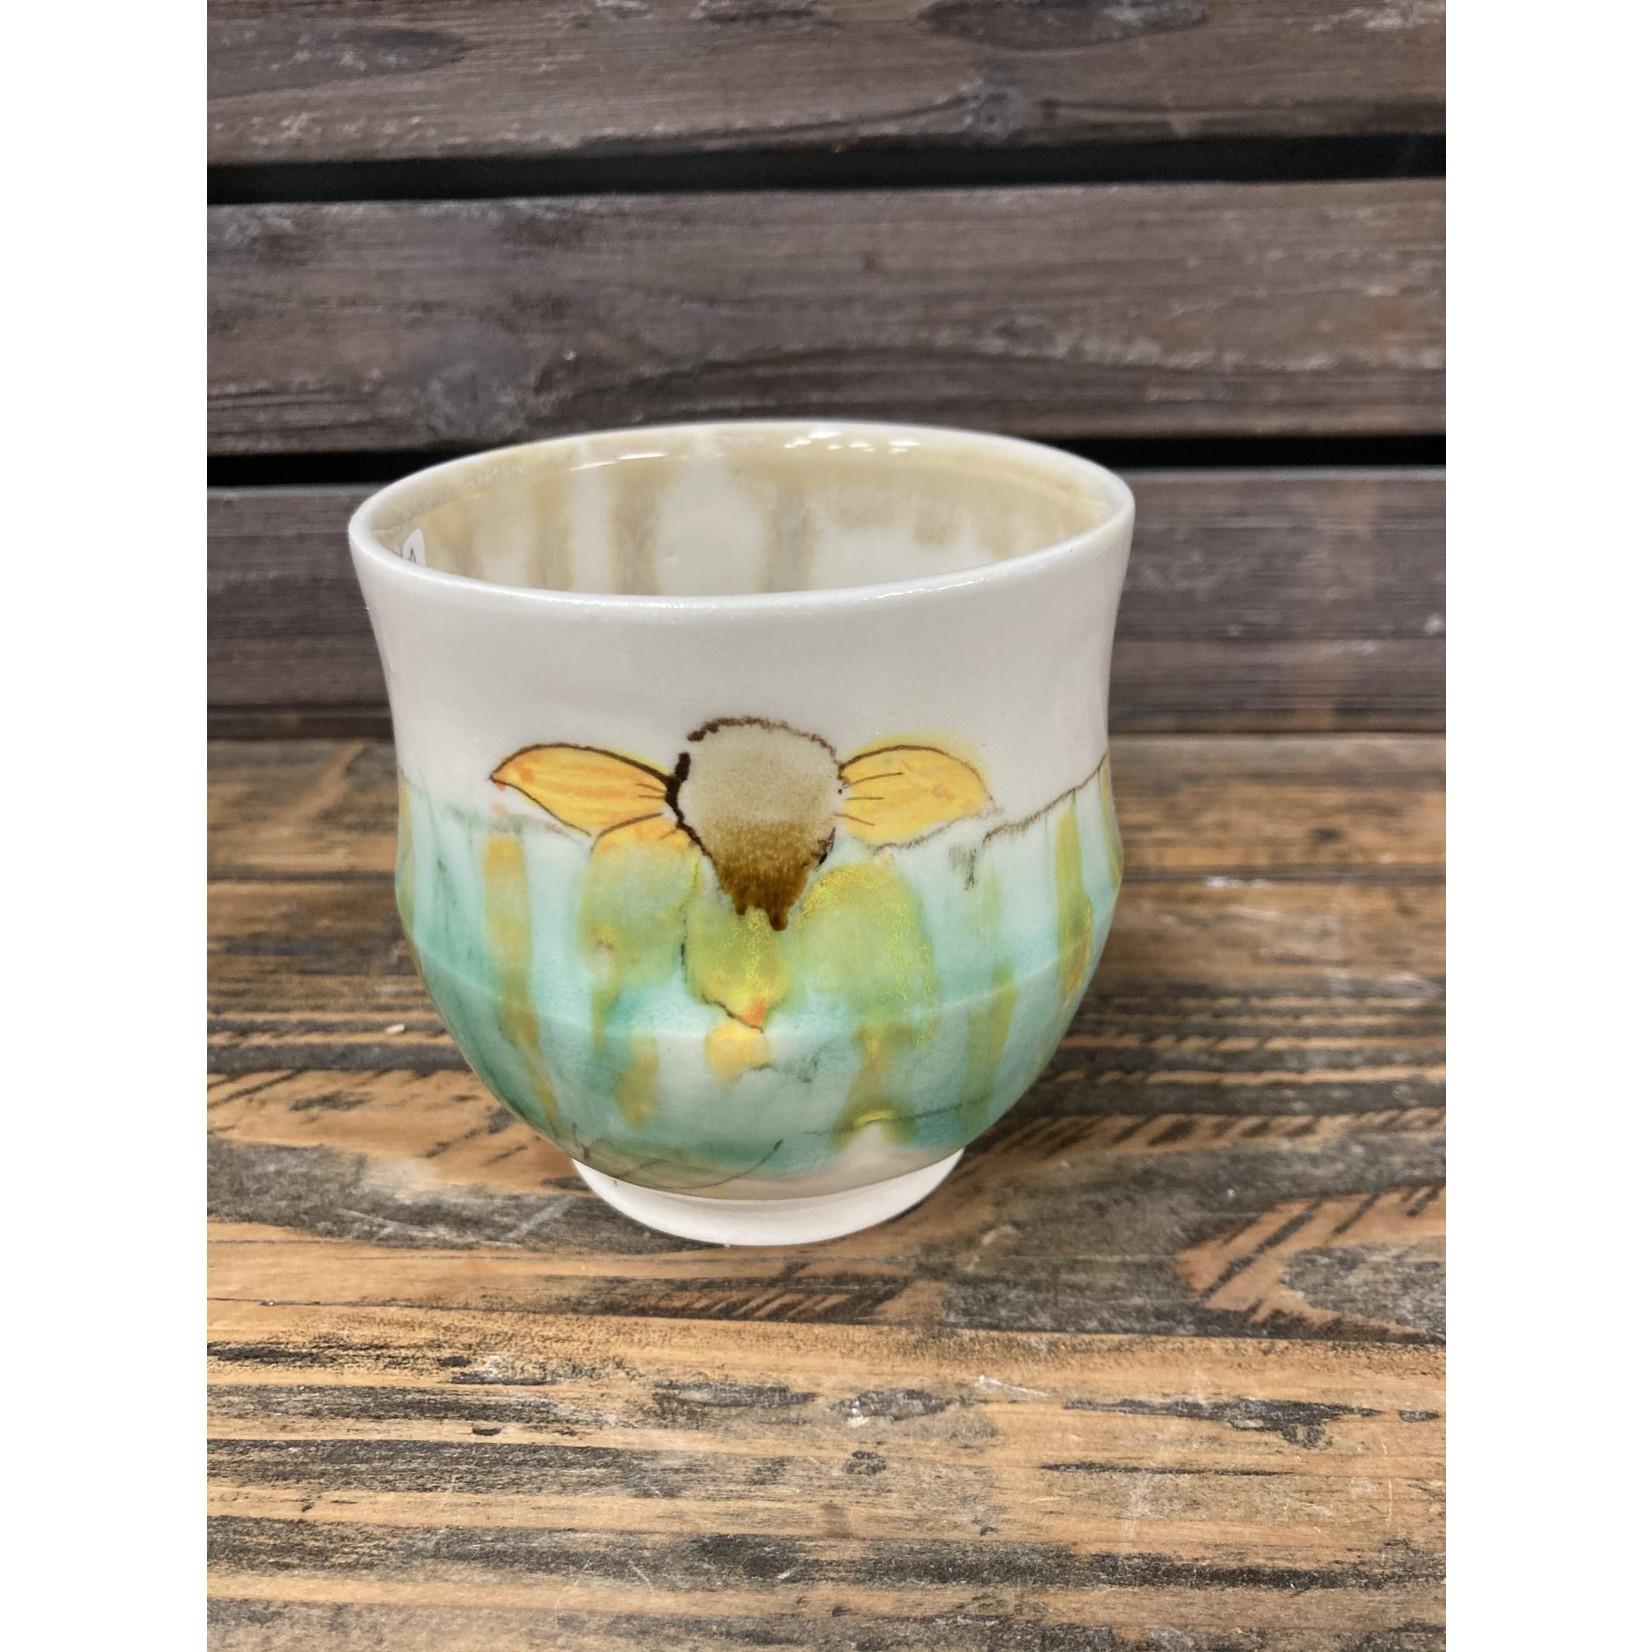 Karen McKee Karen McKee | Tea bowl |blue with yellow flower taller